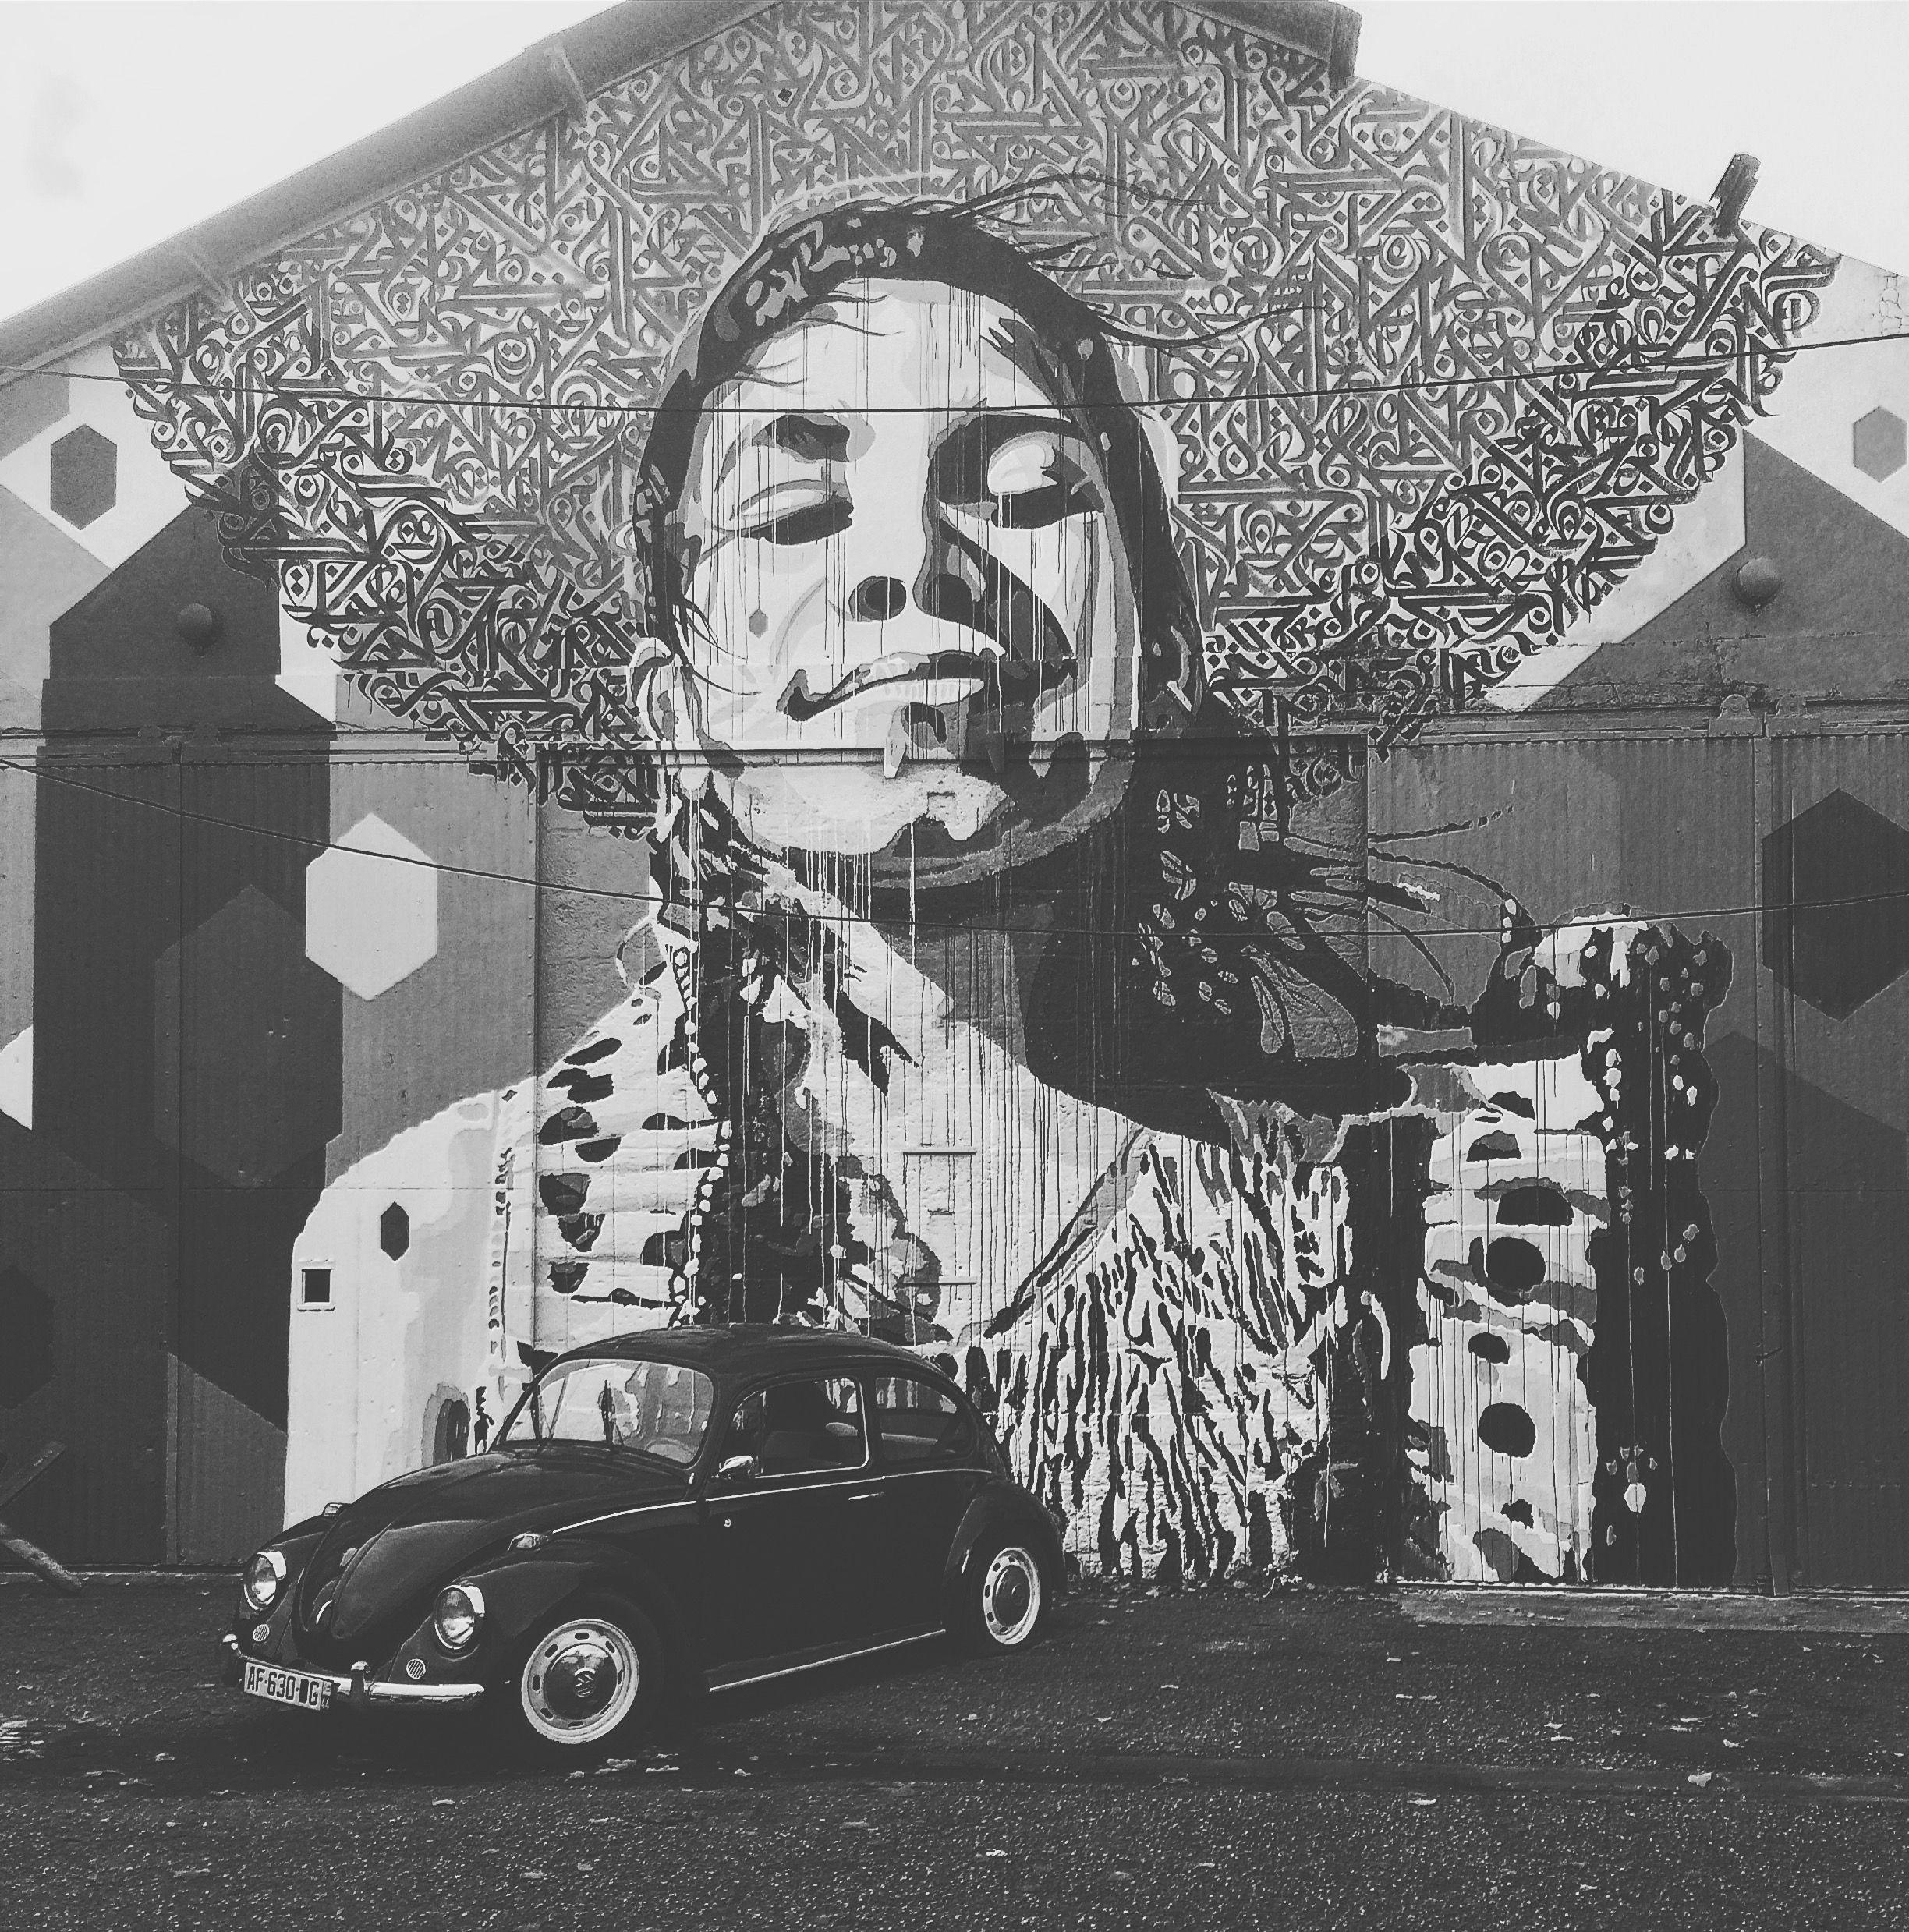 Darwin street art street art doors and other interesting photos